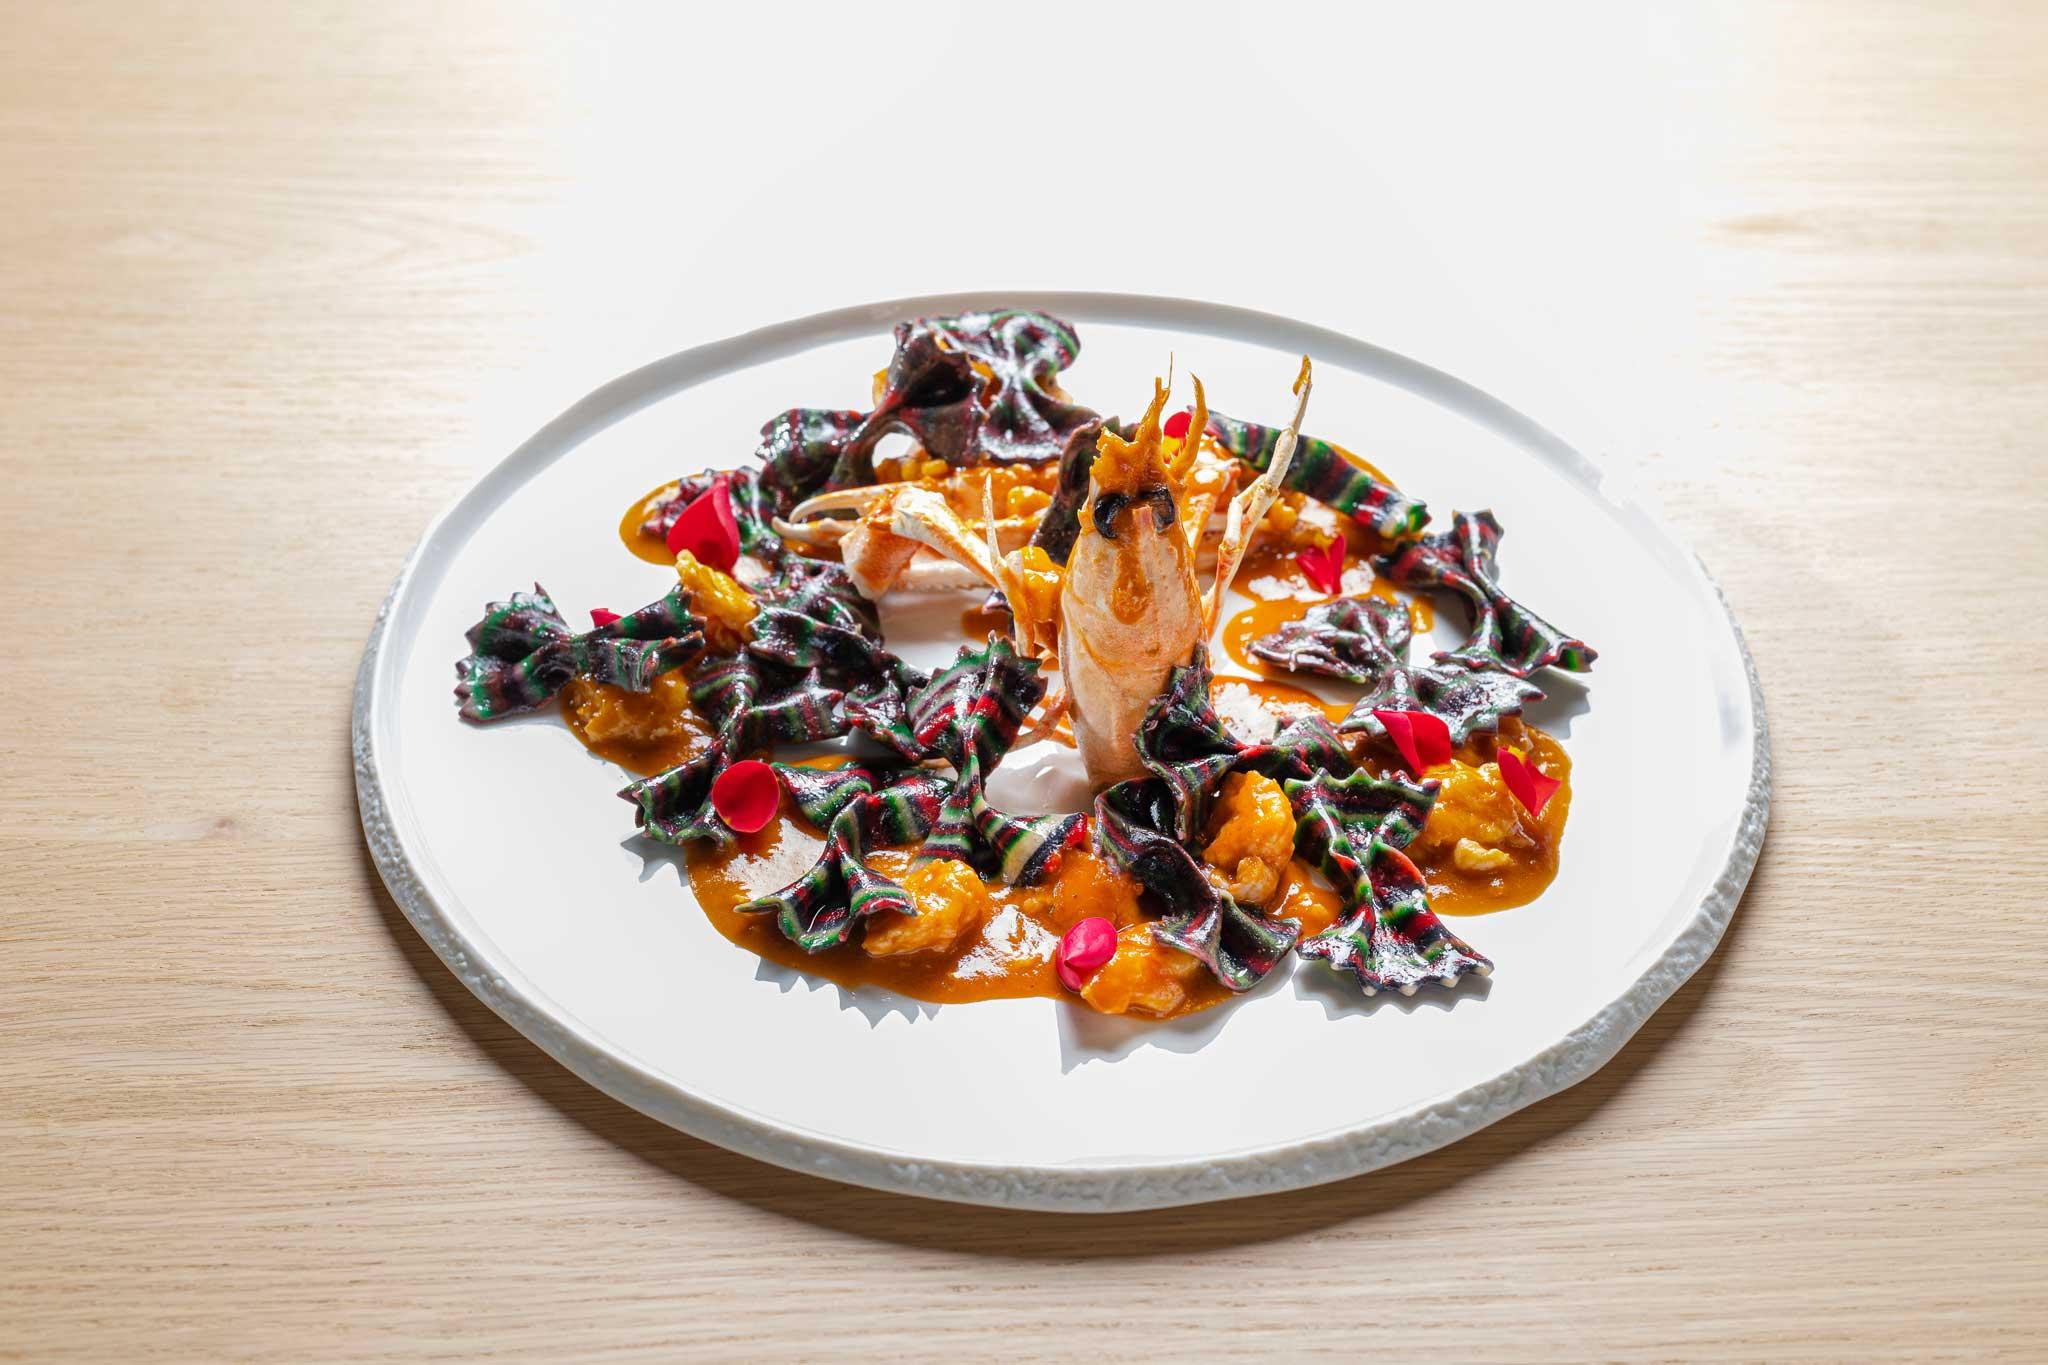 Cocina mediterranea – Restaurante Nomada